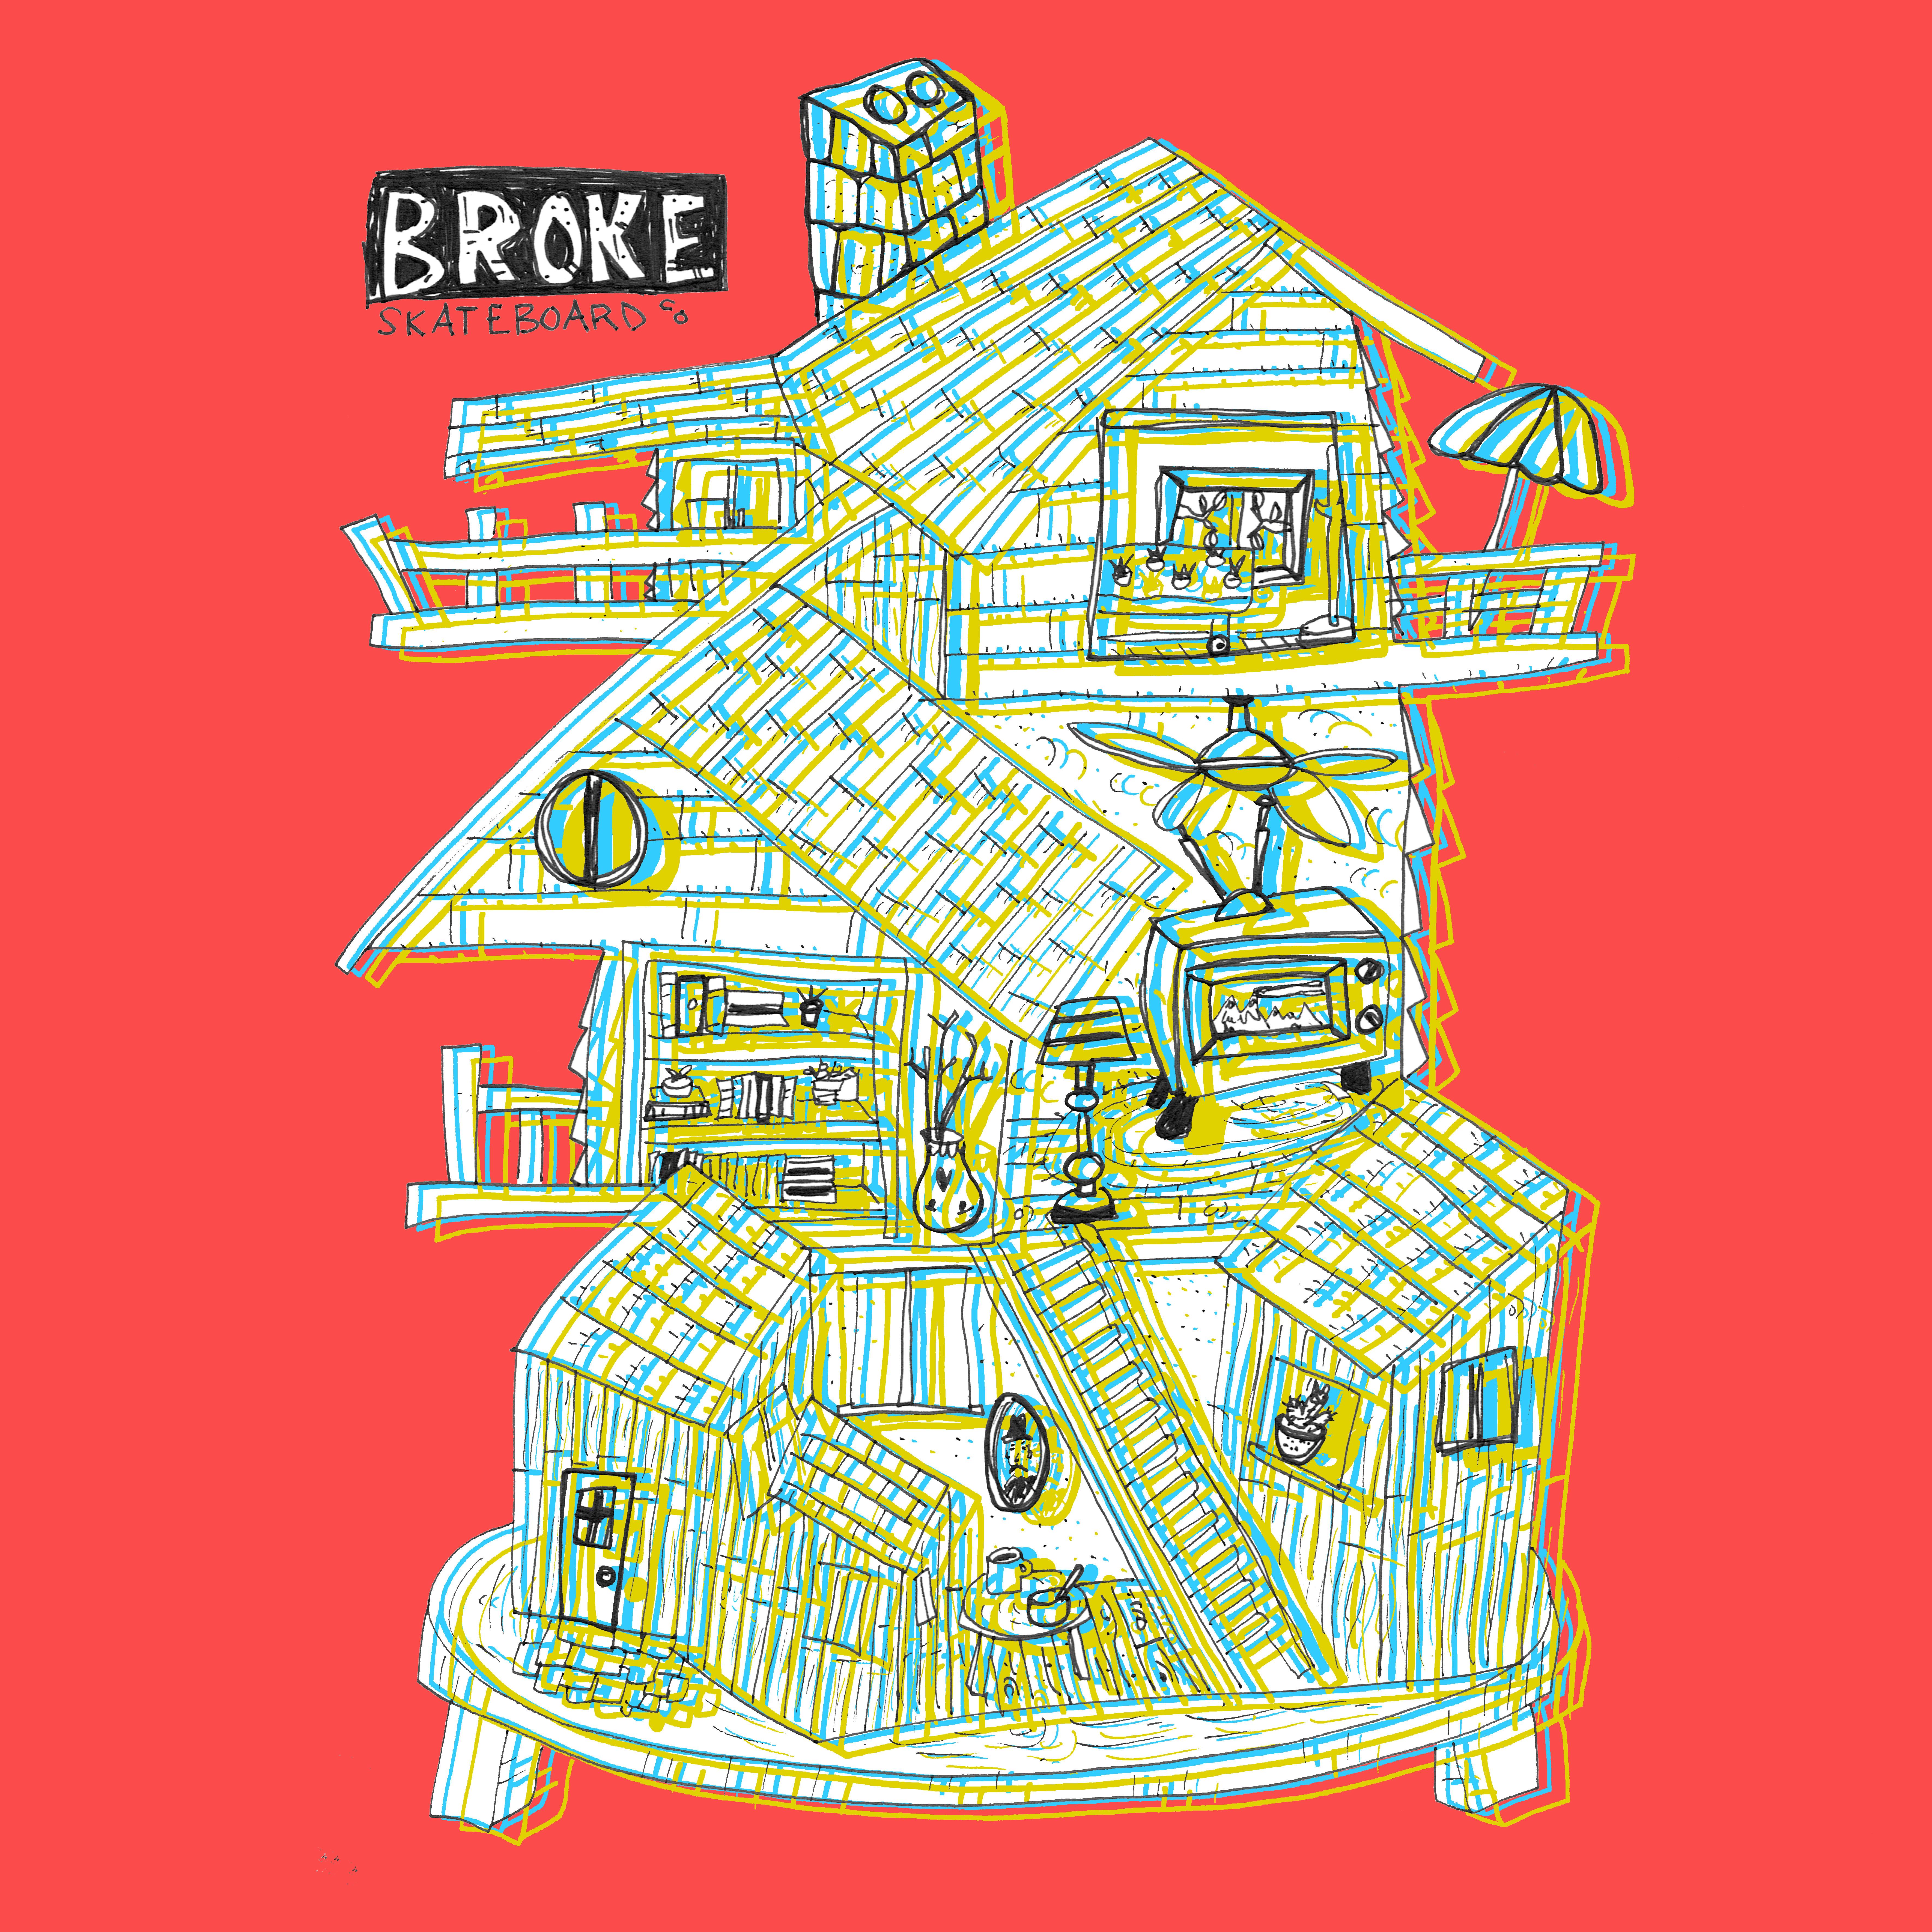 brokehouse.jpg